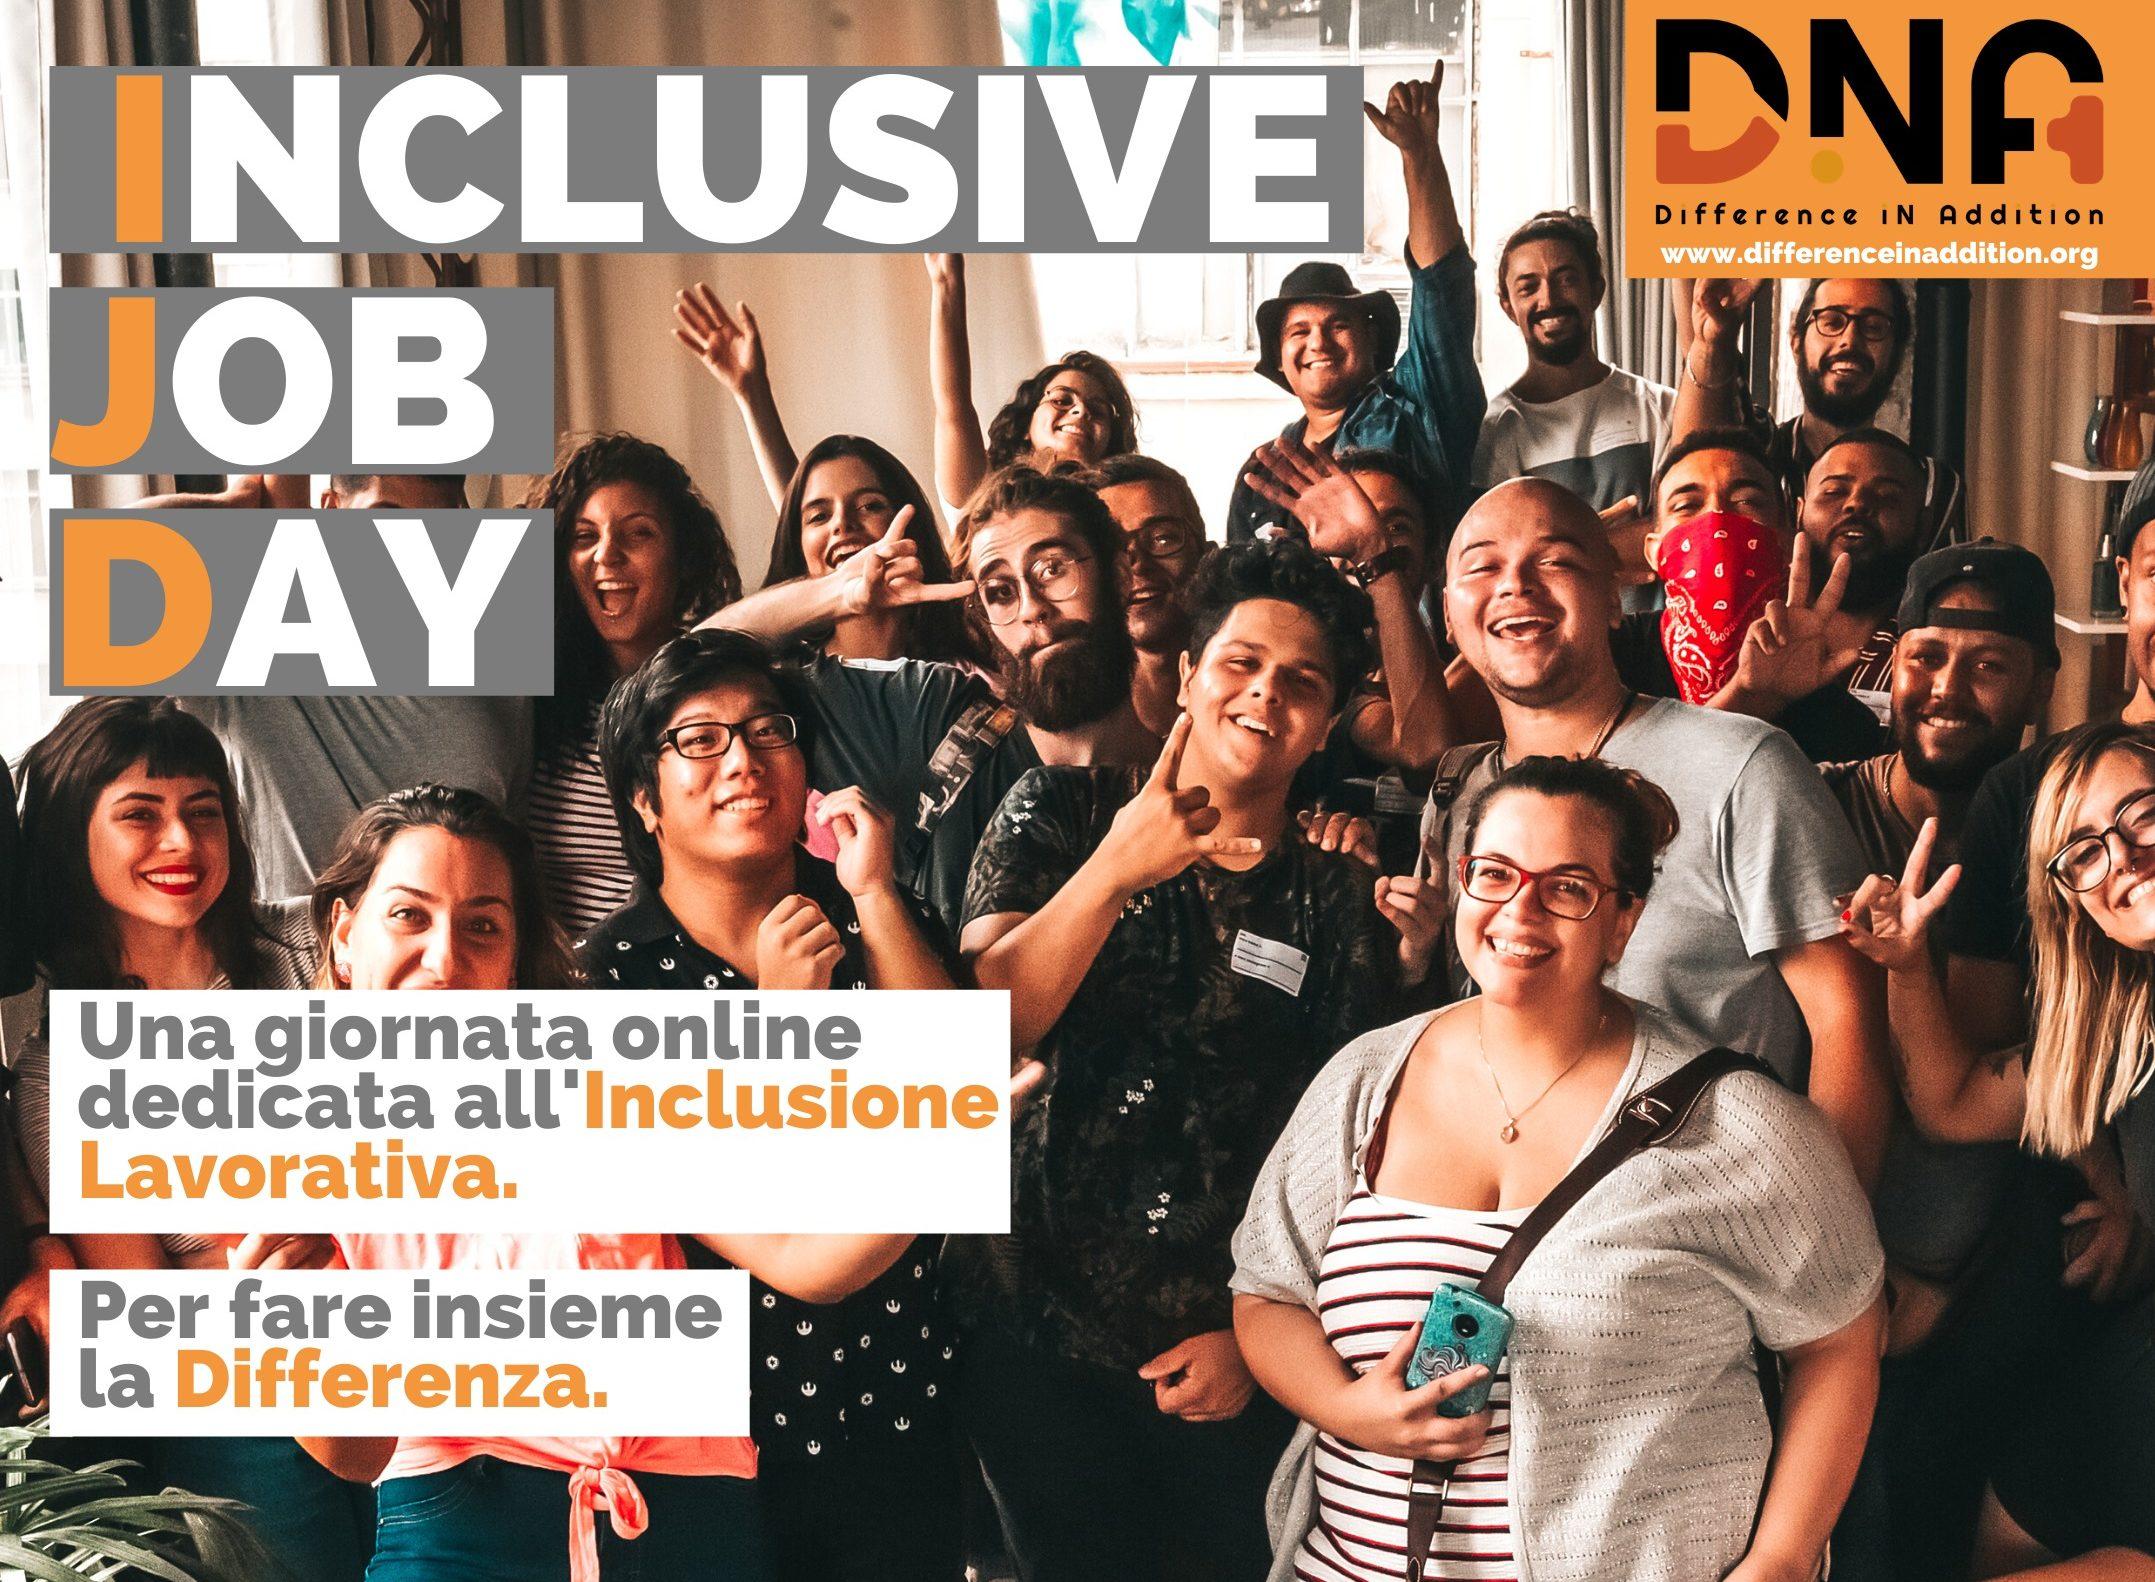 DNA Inclusive Job Day